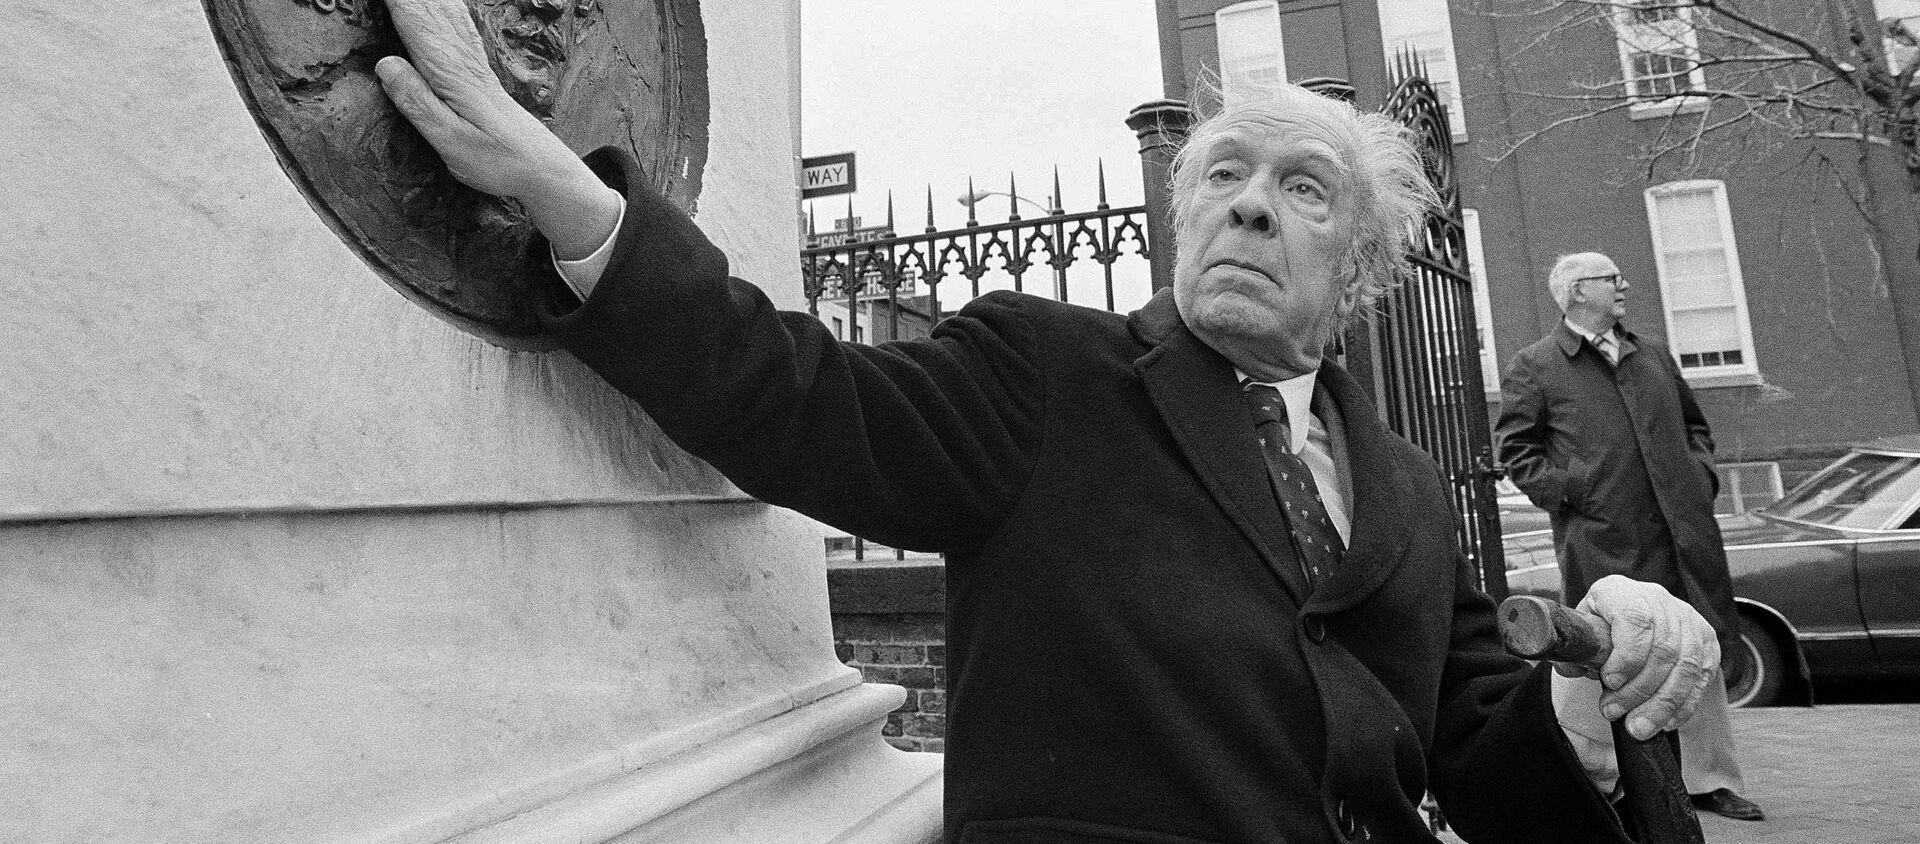 Jorge Luis Borges, el escritor argentino - Sputnik Mundo, 1920, 05.09.2019